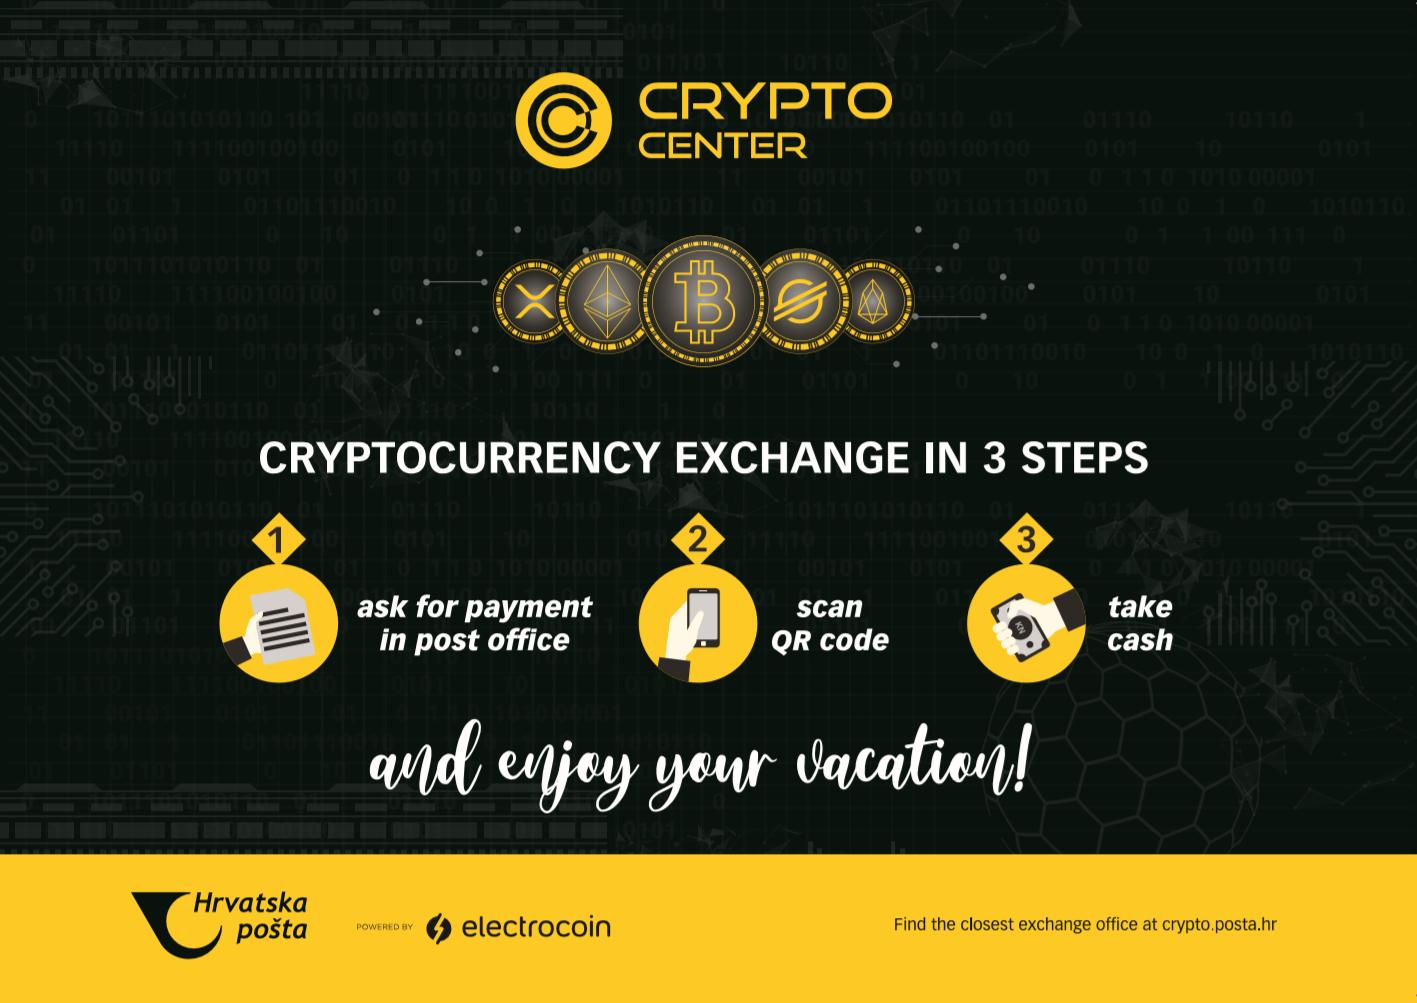 Kripto ulaganje u bitchair